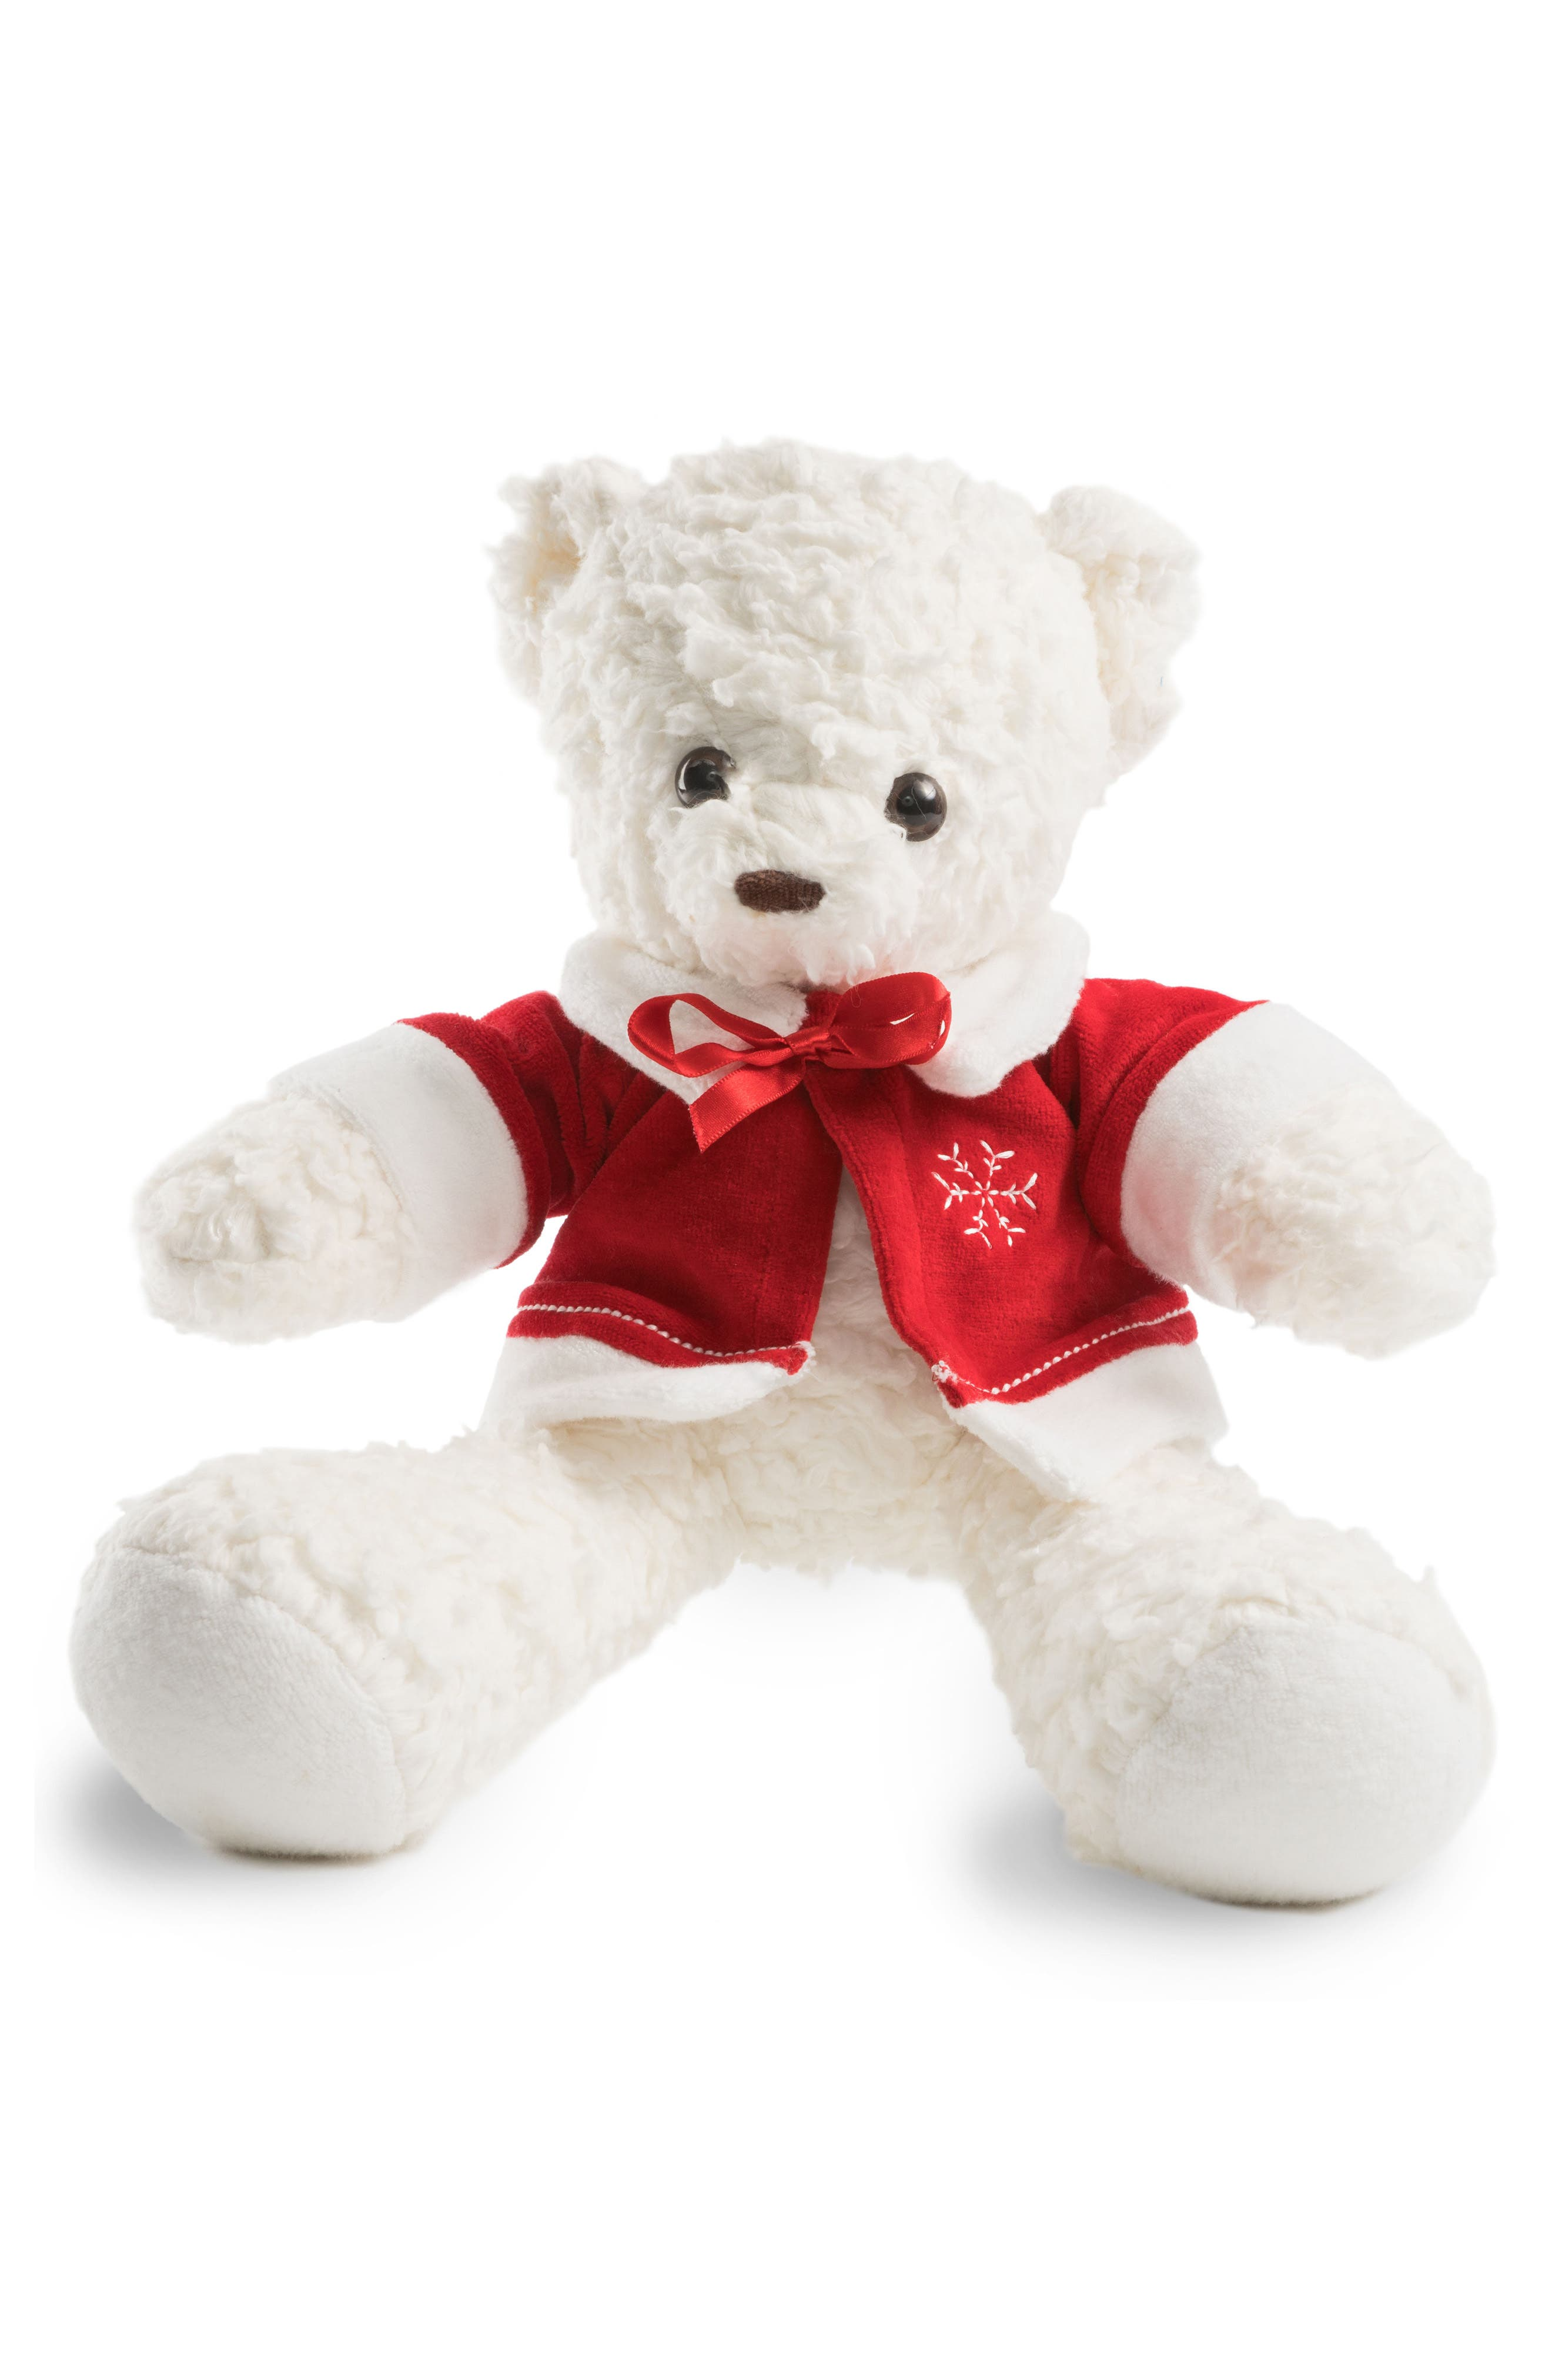 Main Image - Bears for Humanity Medium Stuffed Bear with Holiday Jacket